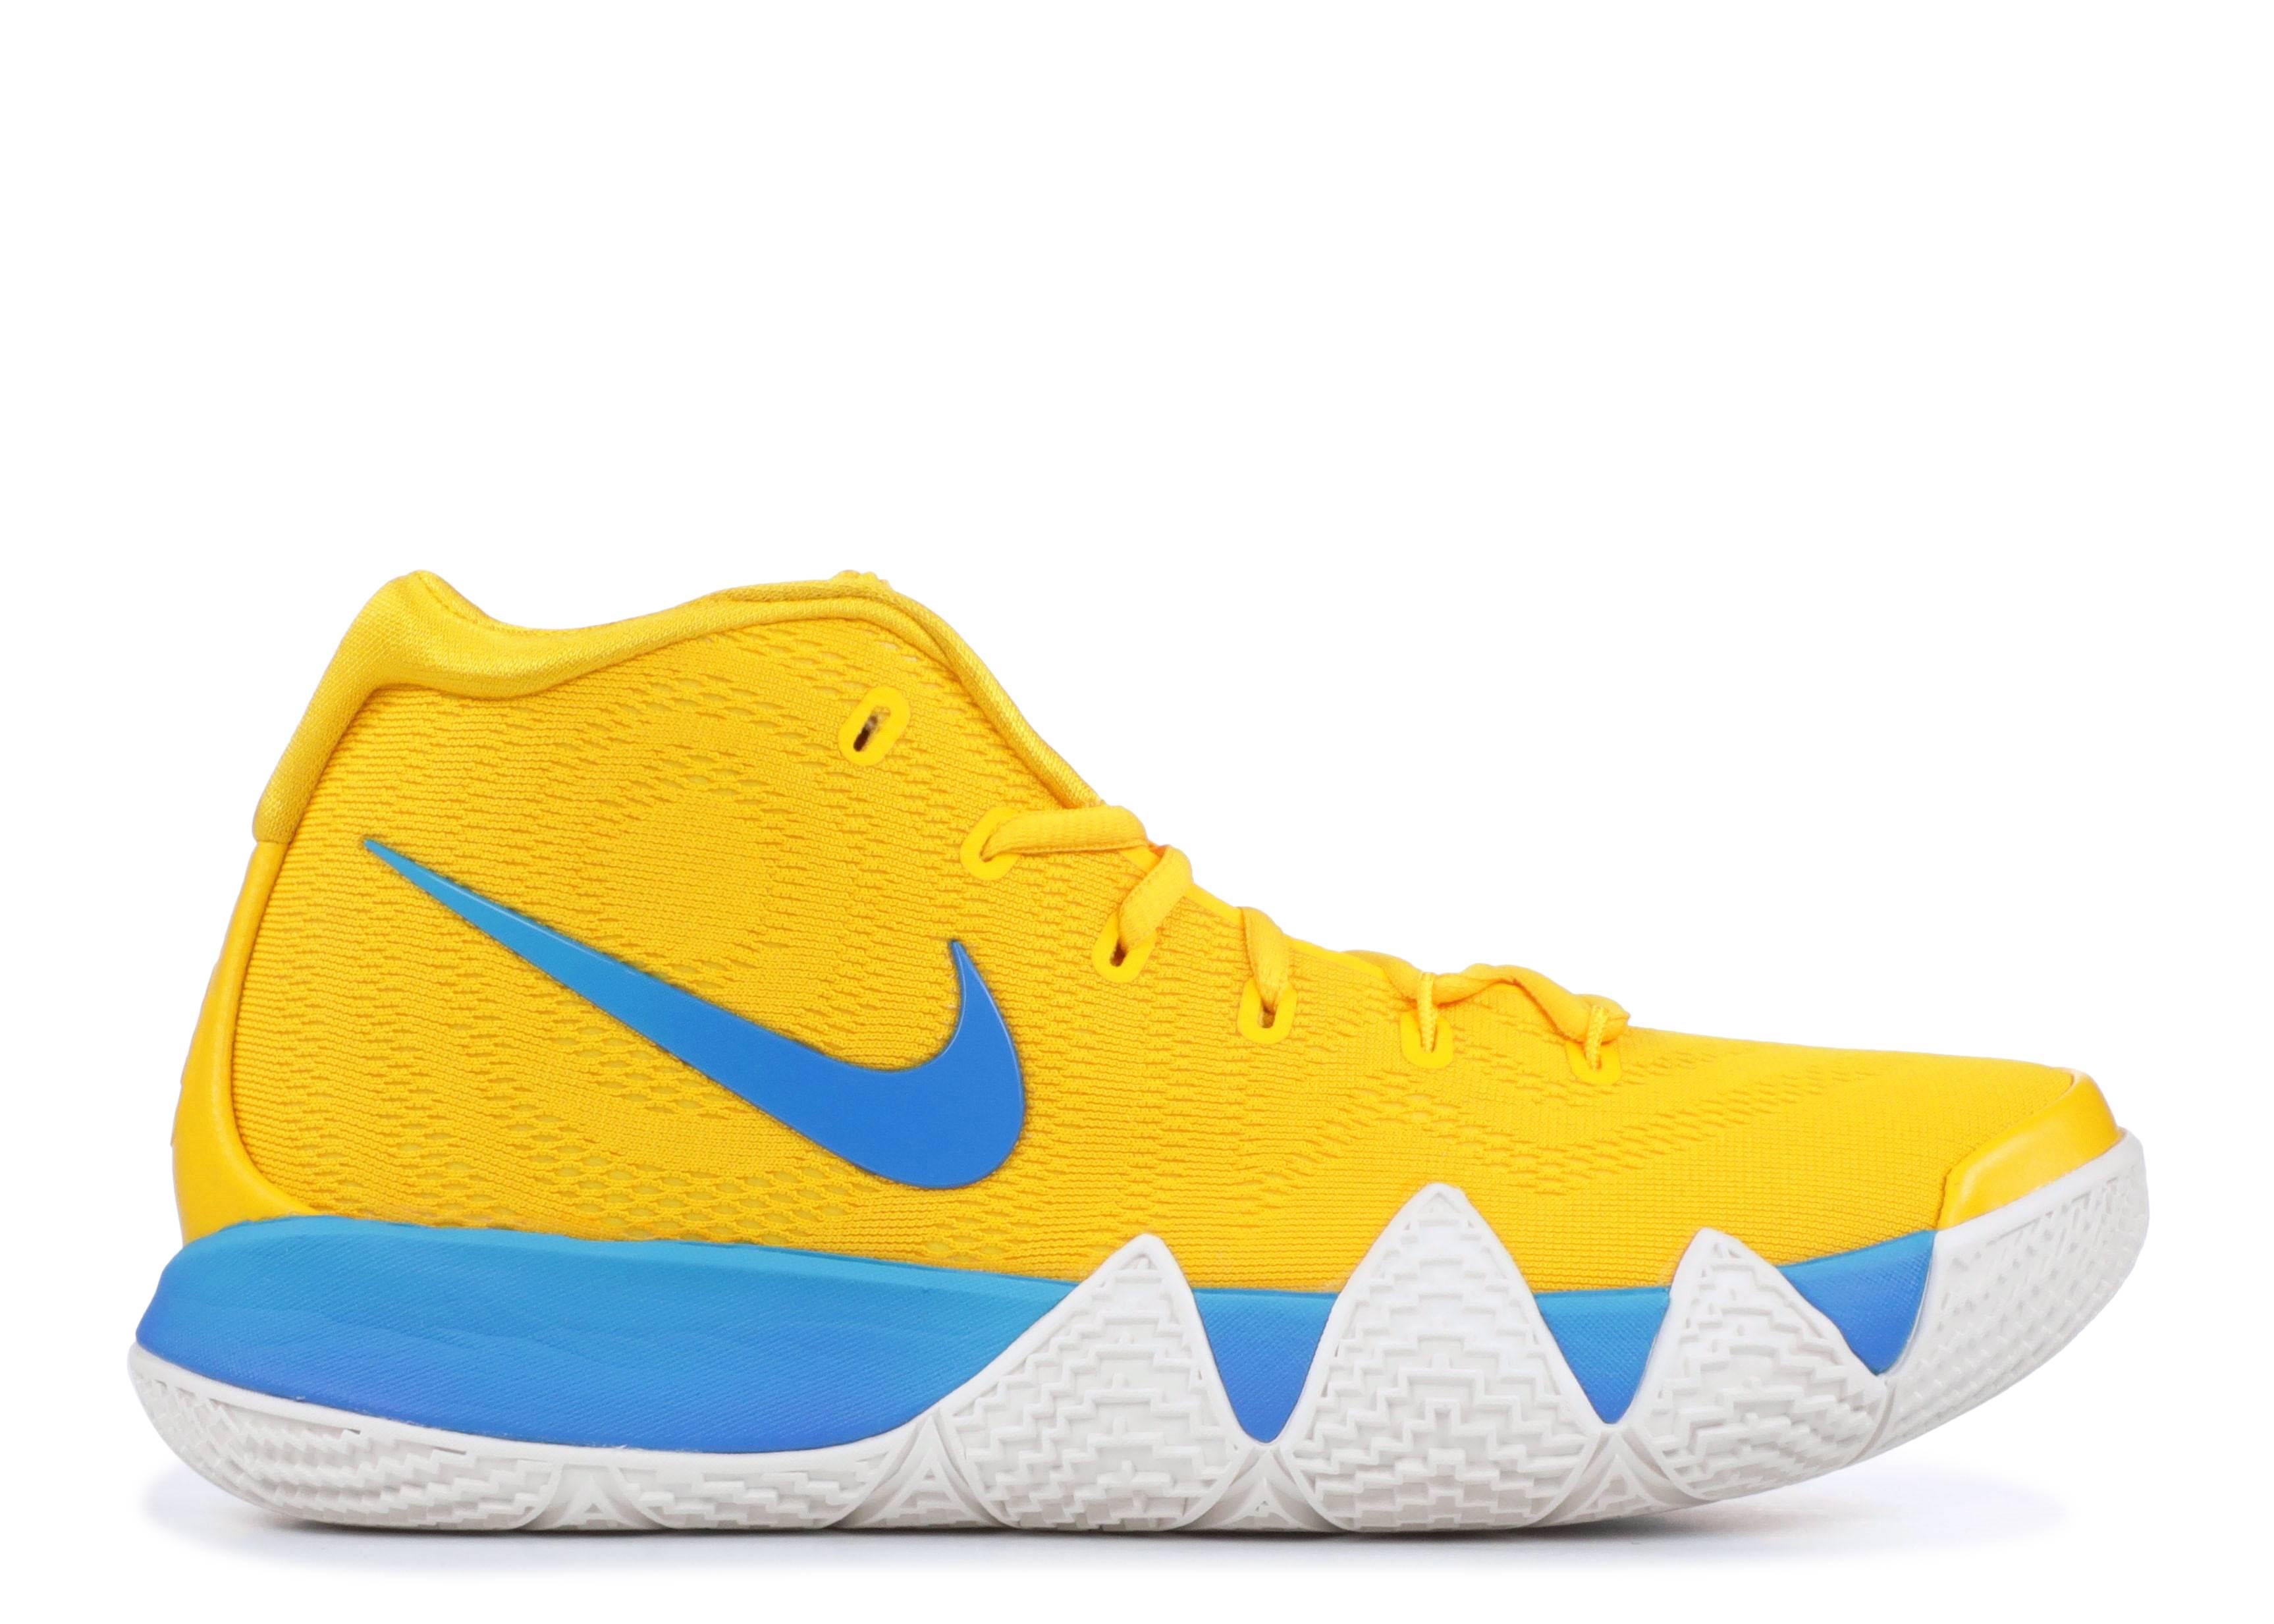 75ffbf0b07c6 Kyrie Irving - Nike Basketball - Nike